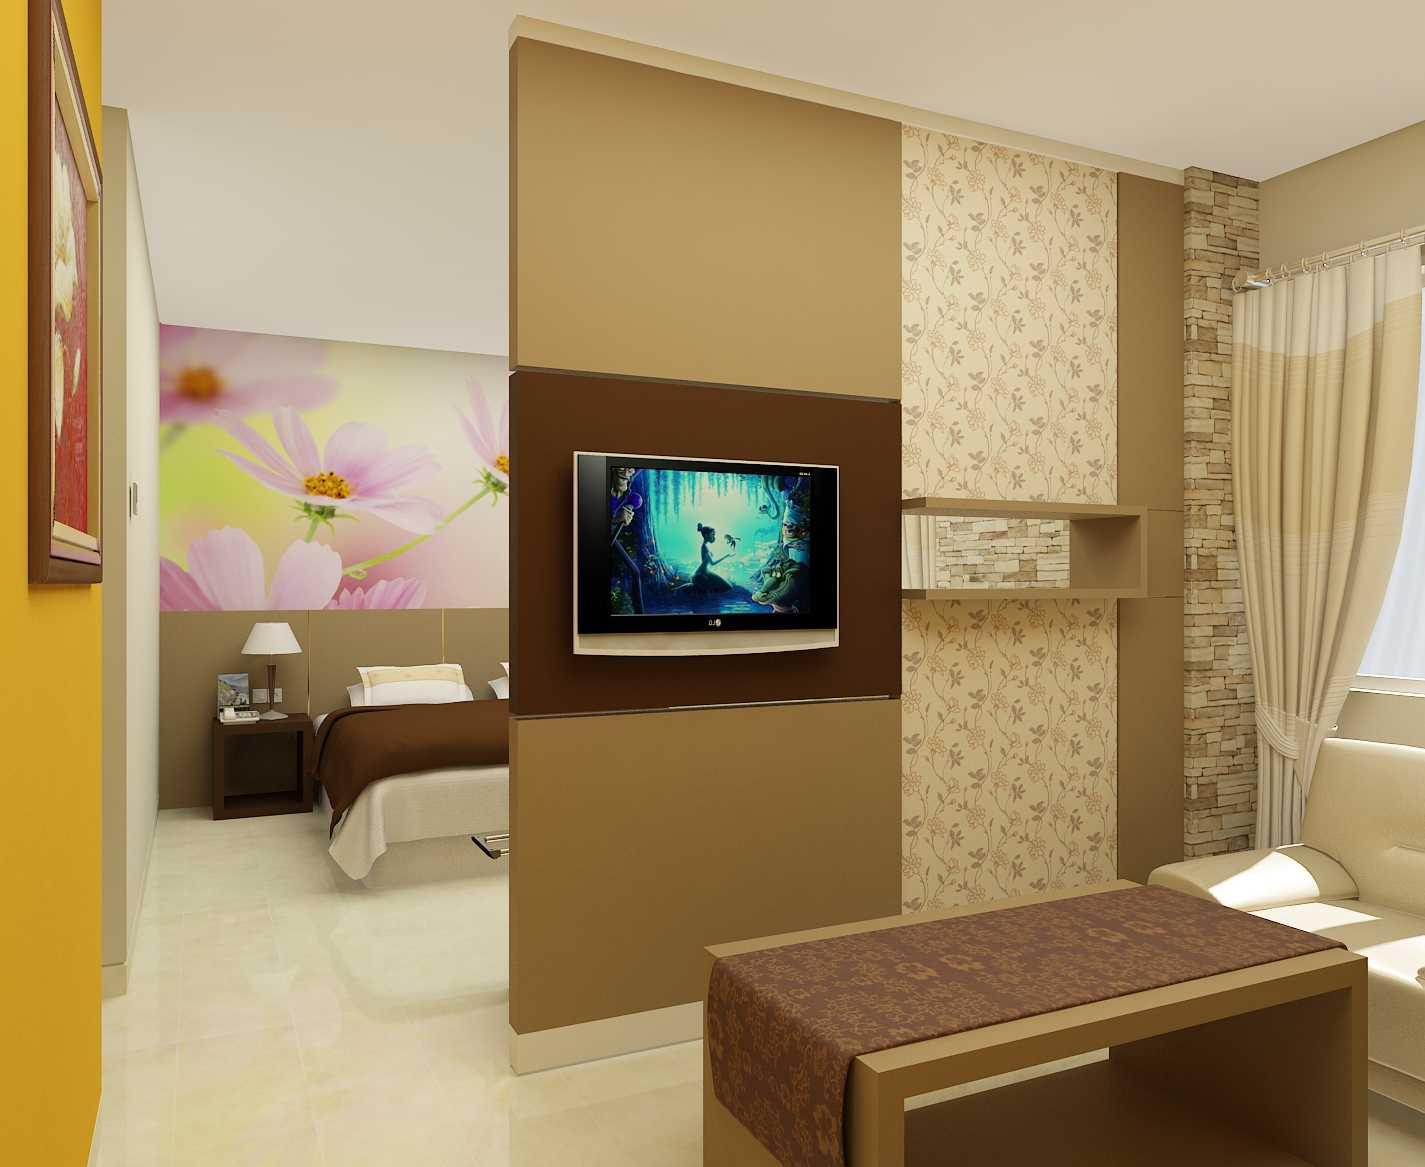 Conarch Studio Dwangsa Hap Hotel Solo Kota Surakarta, Jawa Tengah, Indonesia Kota Surakarta, Jawa Tengah, Indonesia Conarch-Bangun-Sejahtera-Dwangsa-Hap-Hotel-Solo  59937